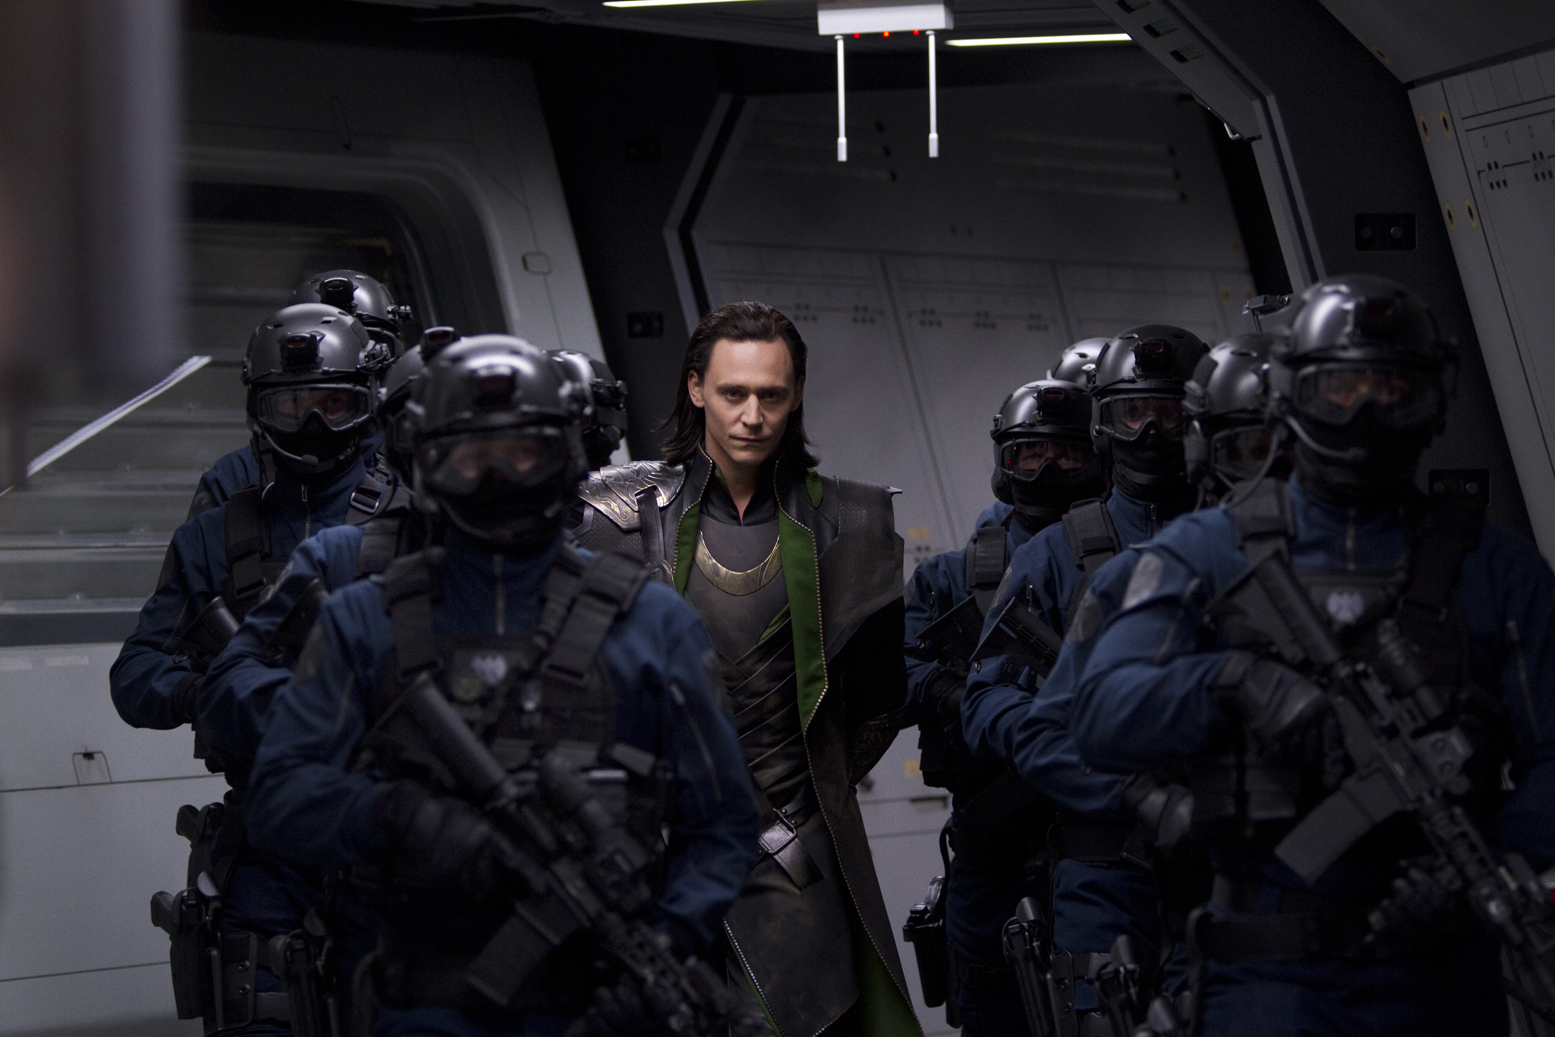 http://collider.com/wp-content/uploads/avengers-movie-image-tom-hiddleston-01.jpg